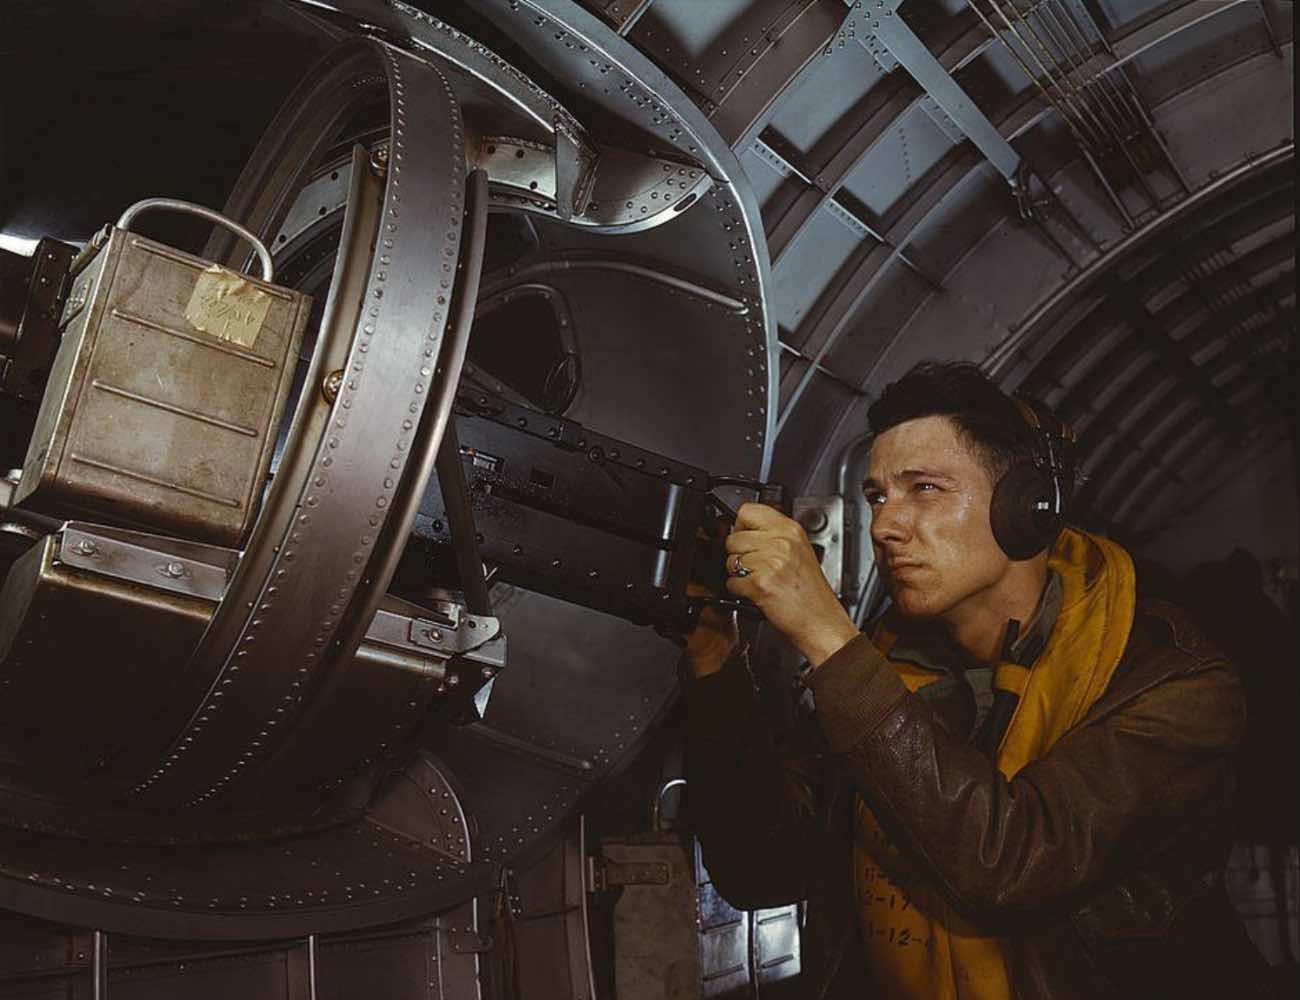 B-17 machine gun, colorized WWII photos